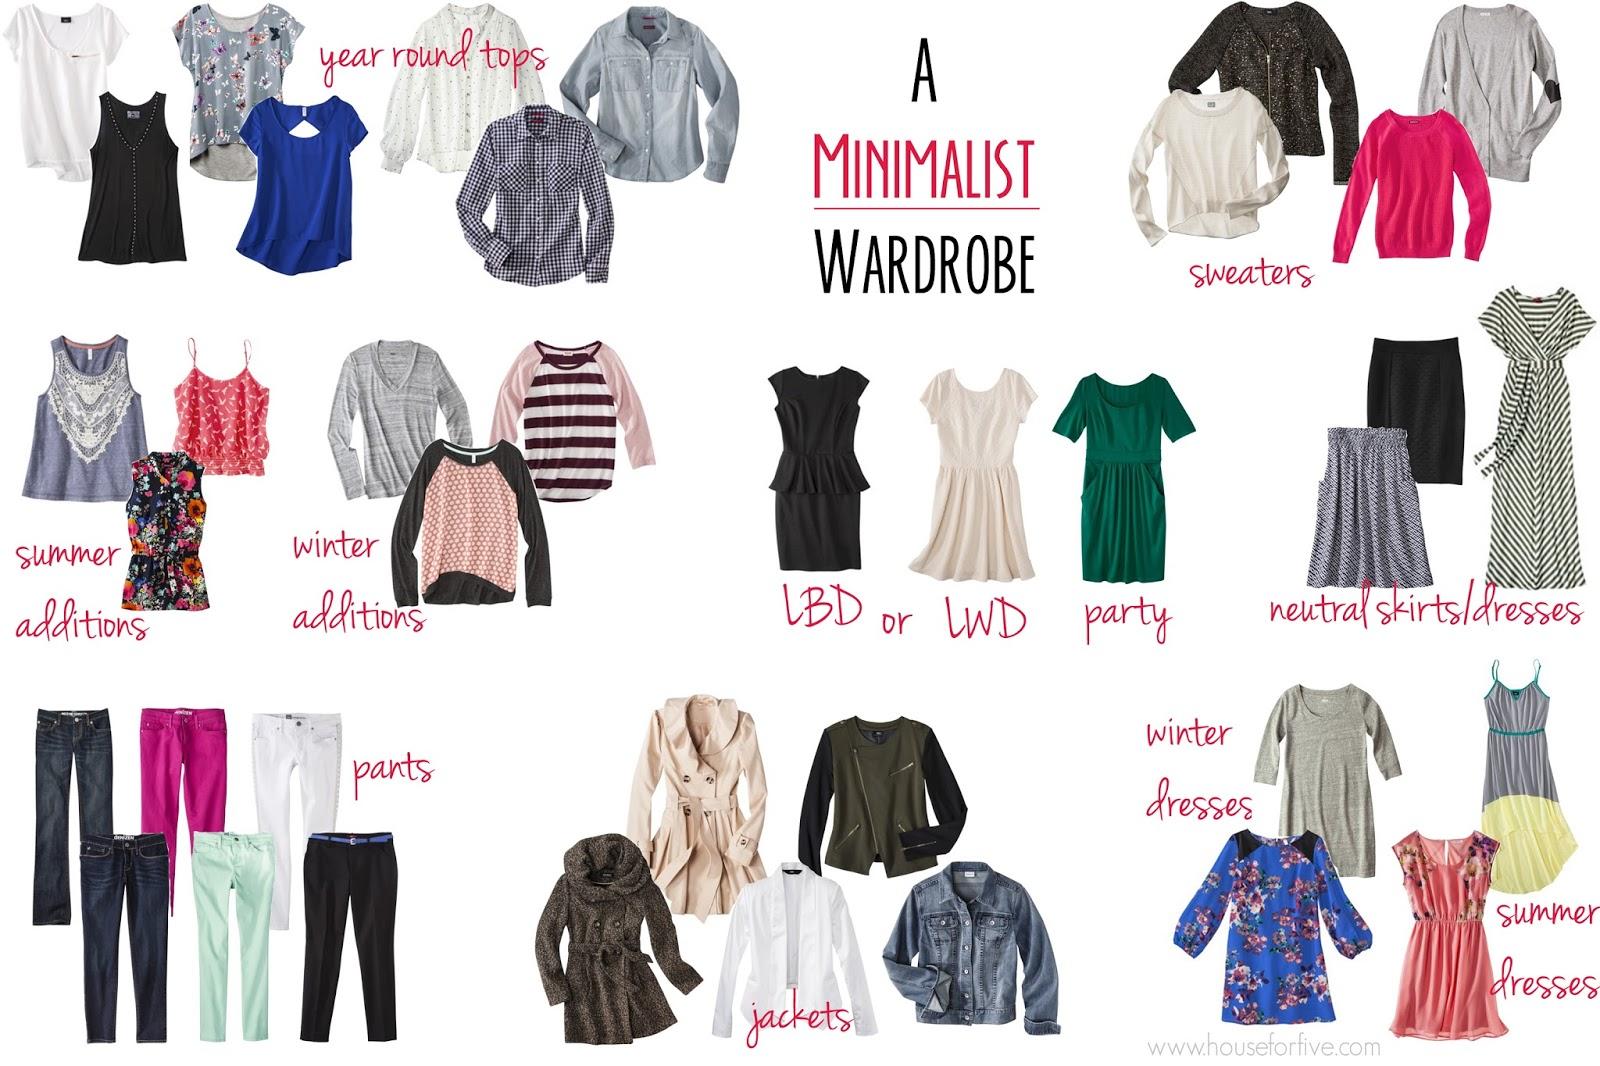 Wardrobe a minimalist wardrobe for Minimalist living 100 things list